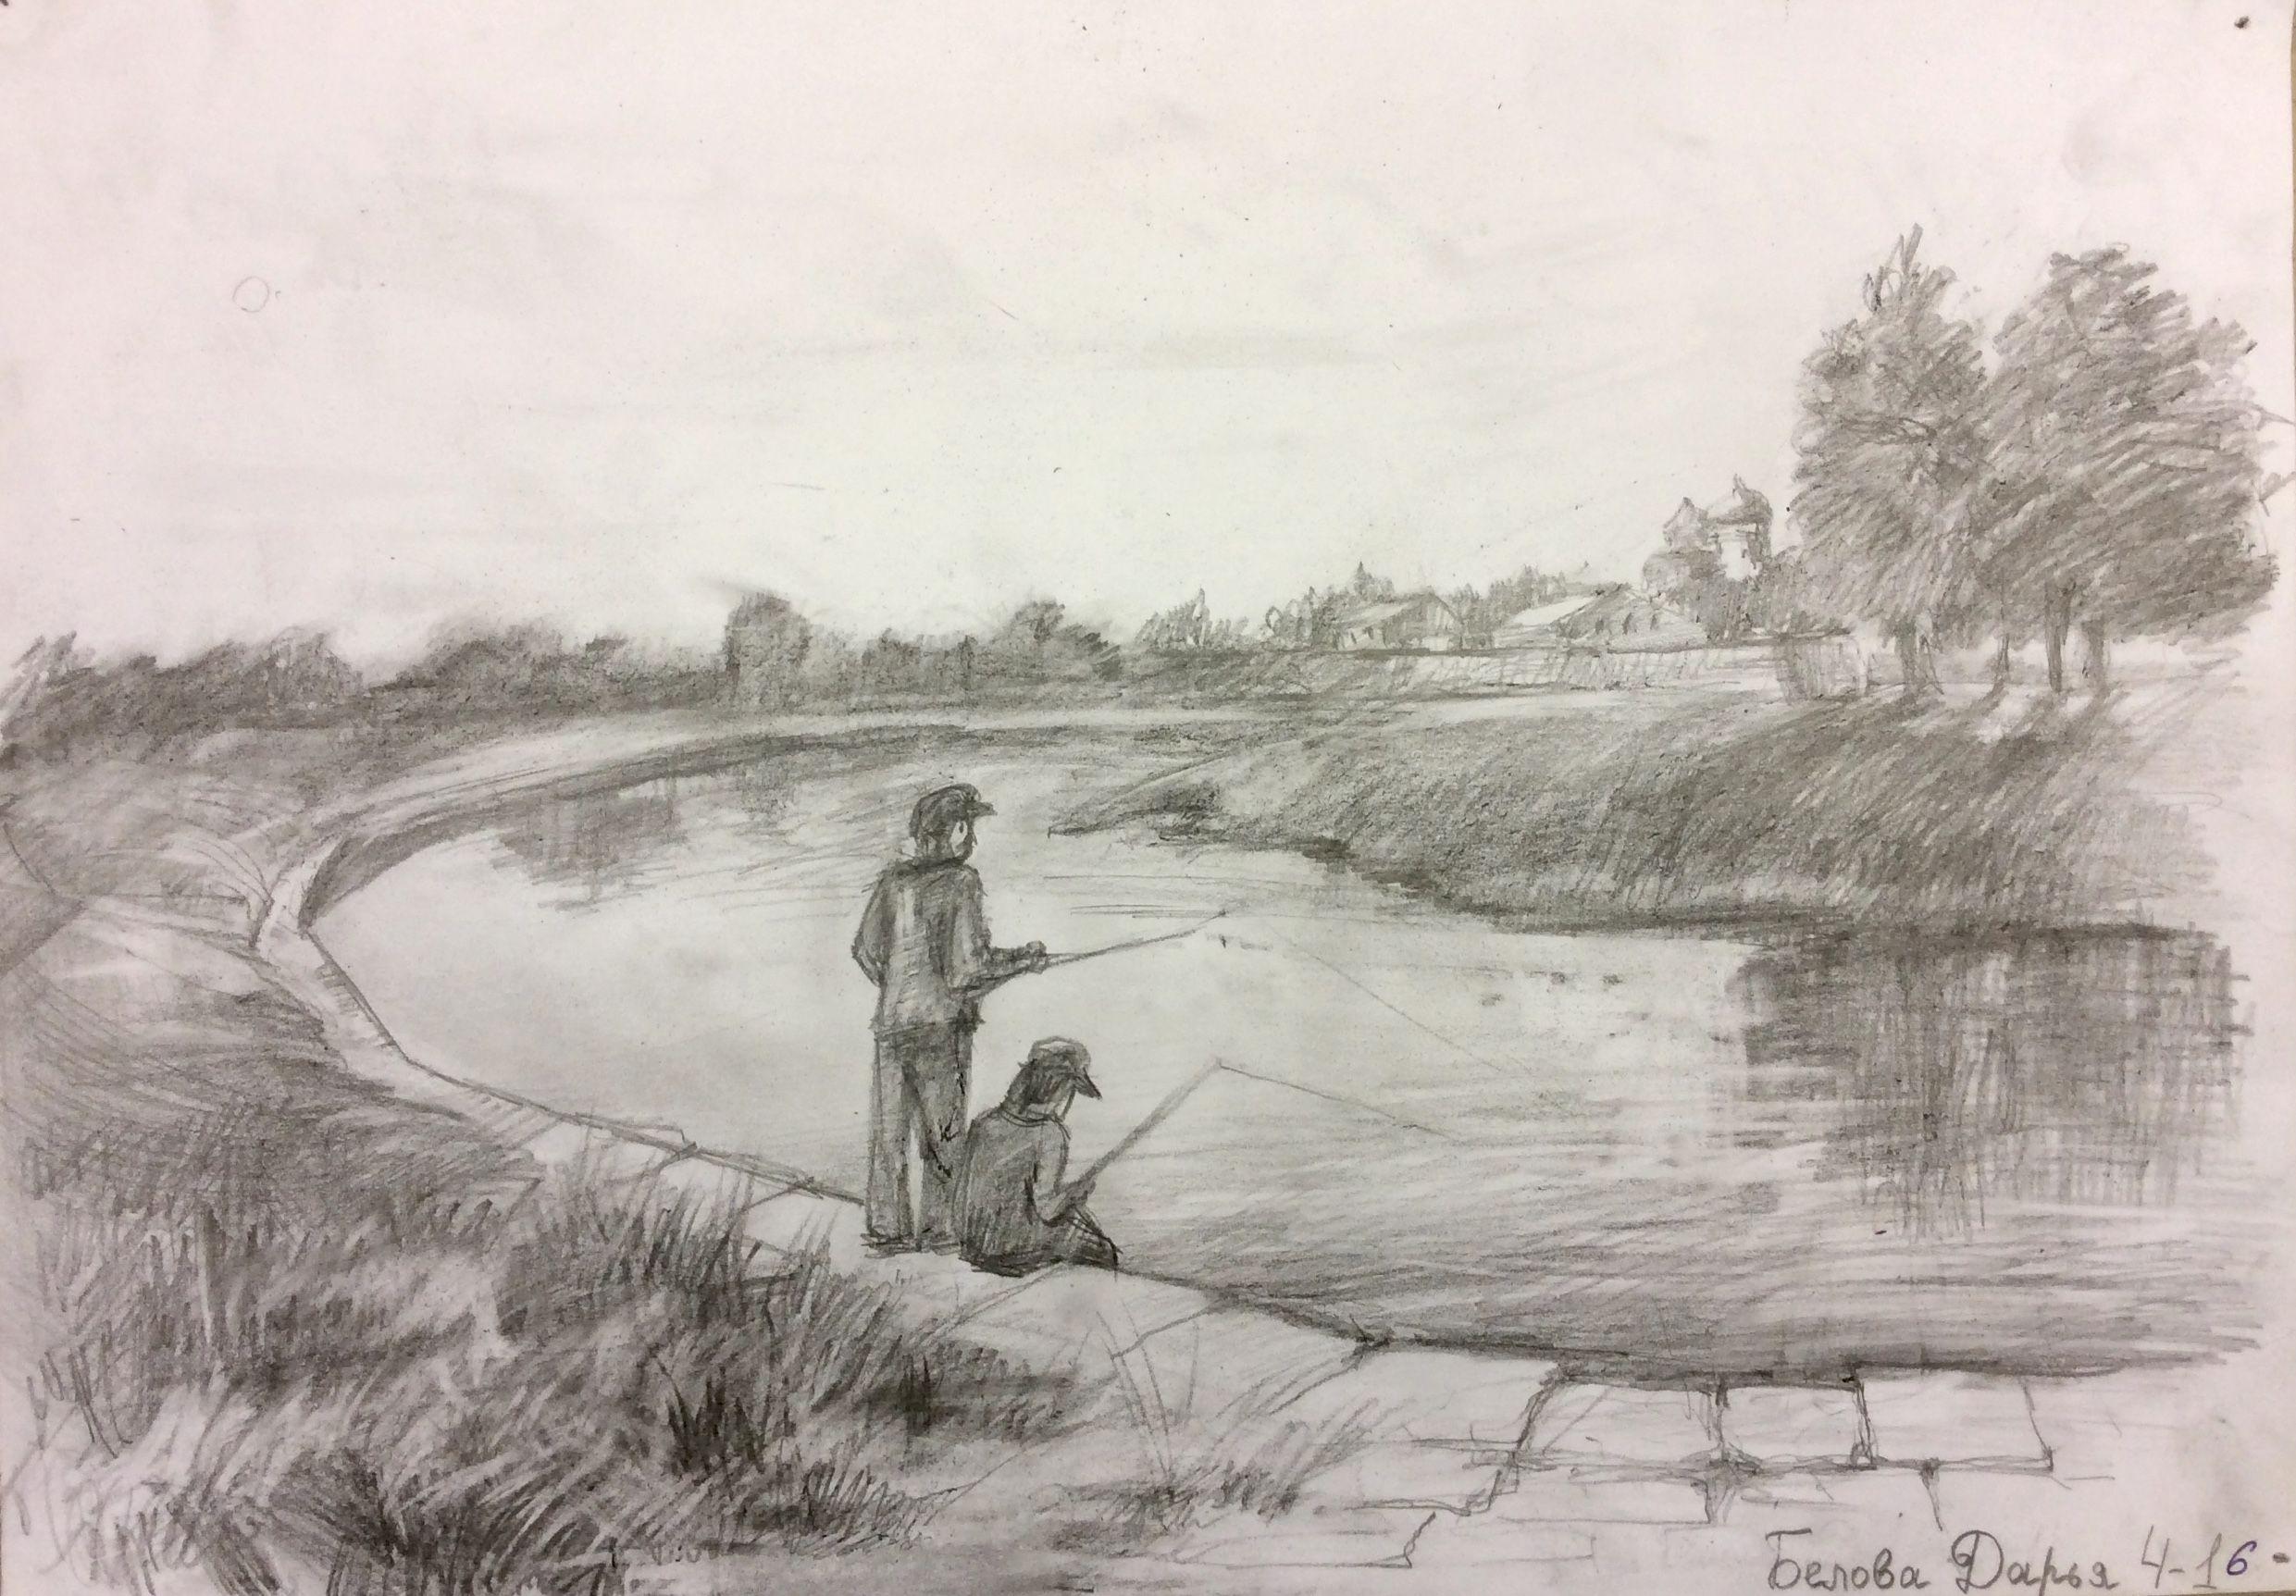 «Рыбалка на реке Тихвинке», Белова Дарья (12 лет), карандаш, преп. С. А. Латыпова